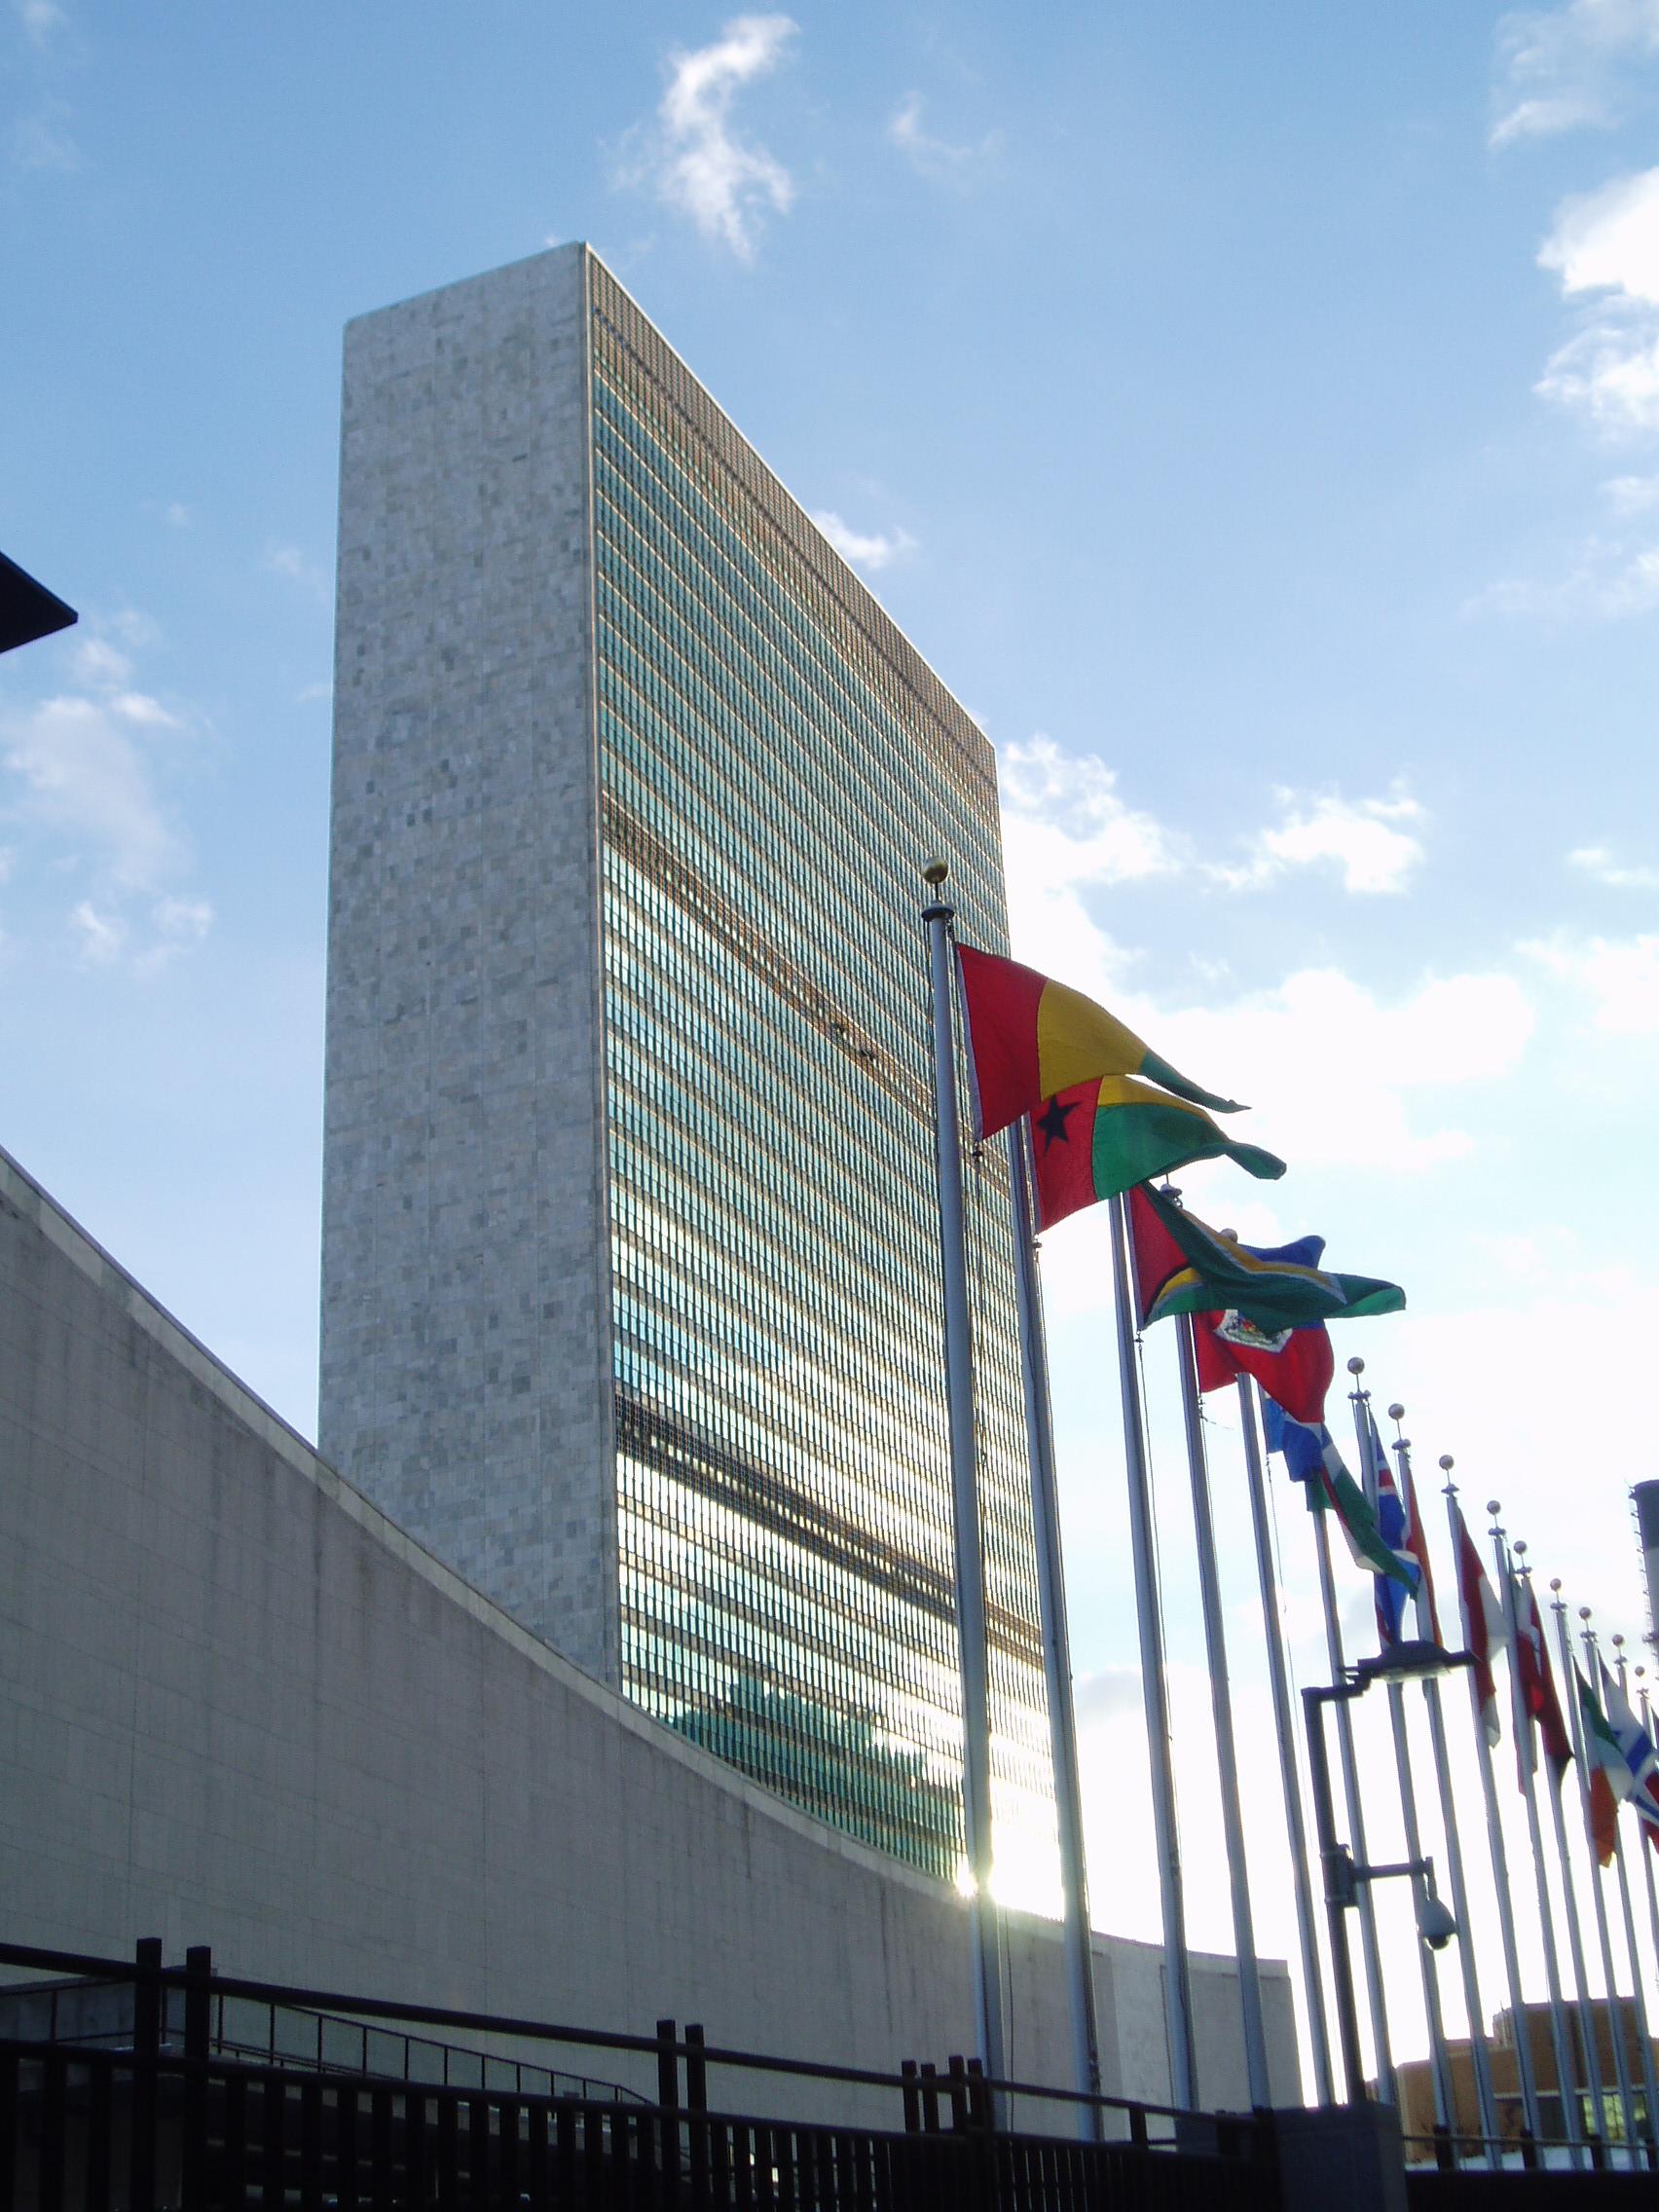 The_United_Nations_Secretariat_Building.jpg